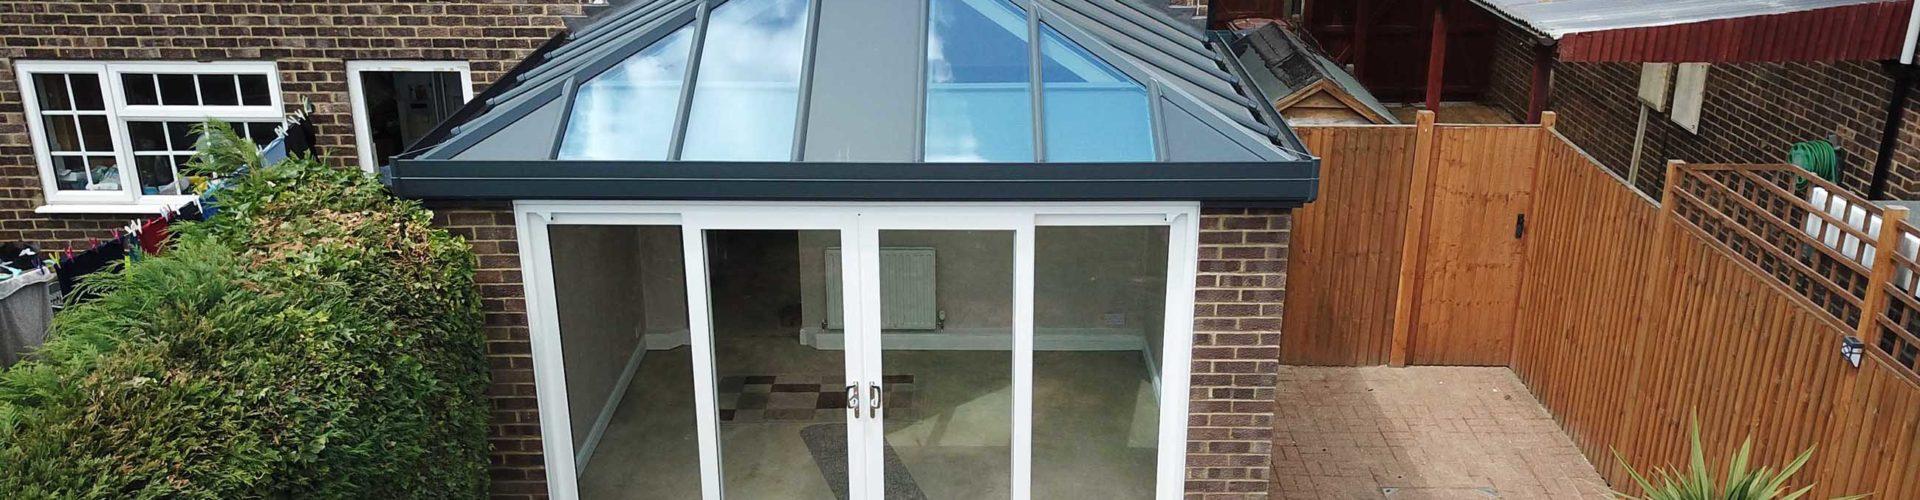 Conservatory Roof Refurbishment, Stevenage